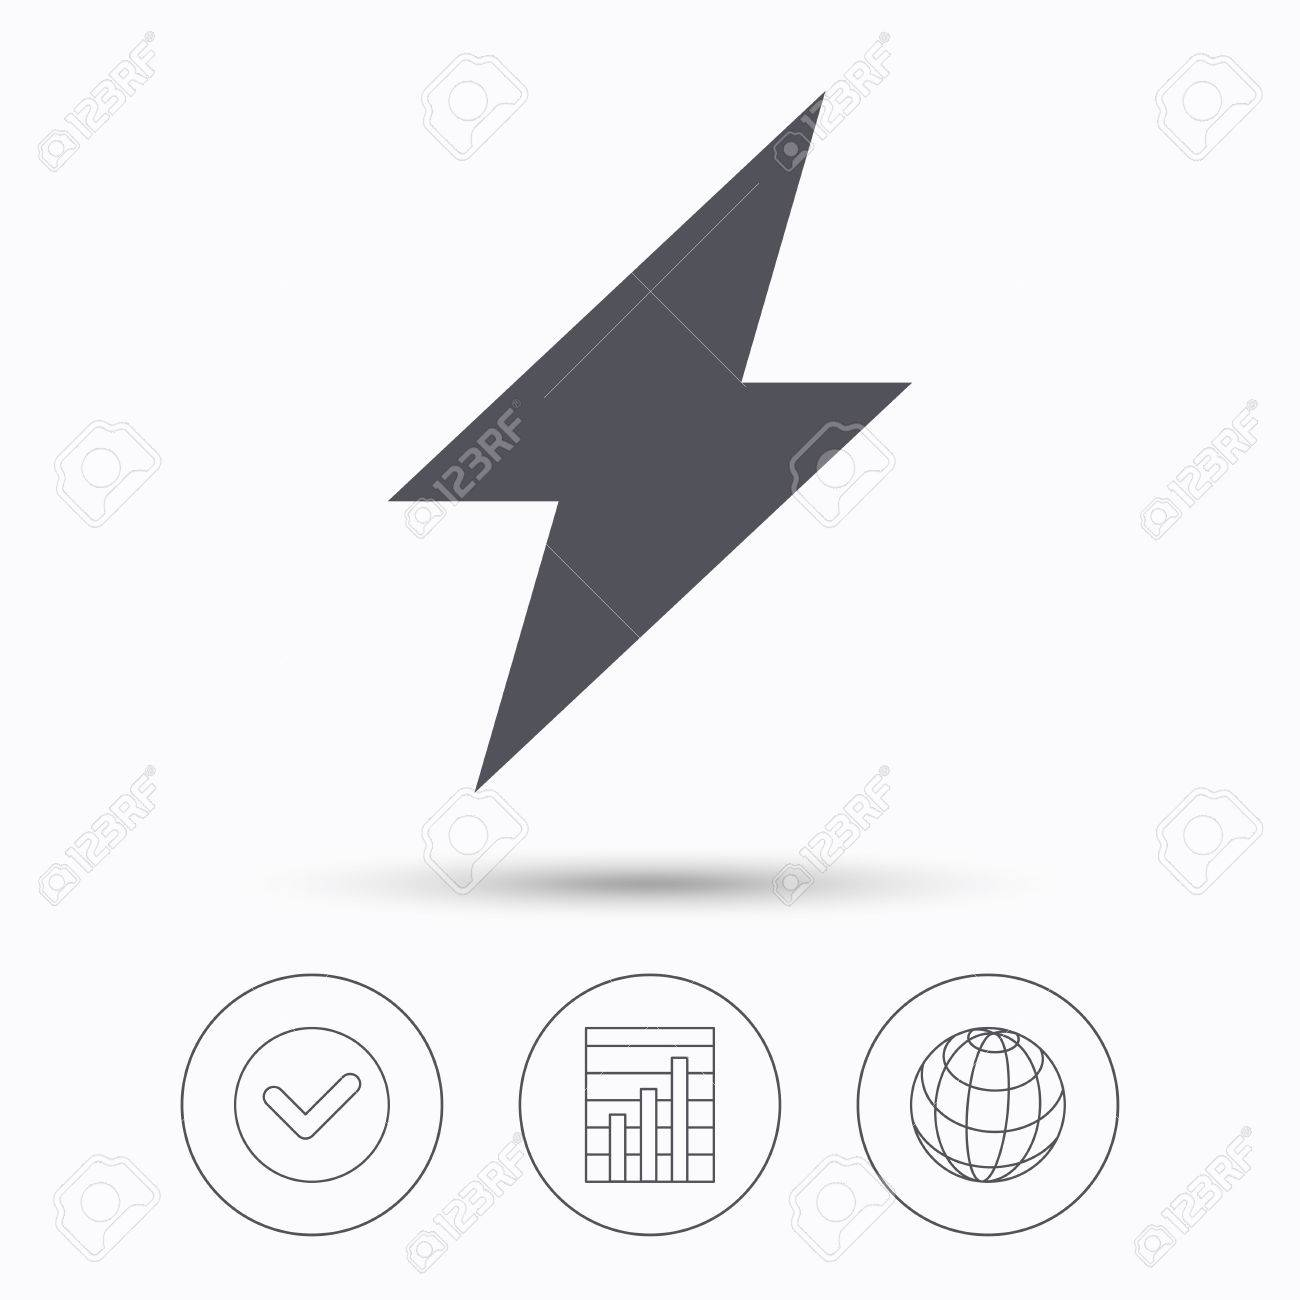 Lightning icon. Electricity energy power symbol. Check tick,..